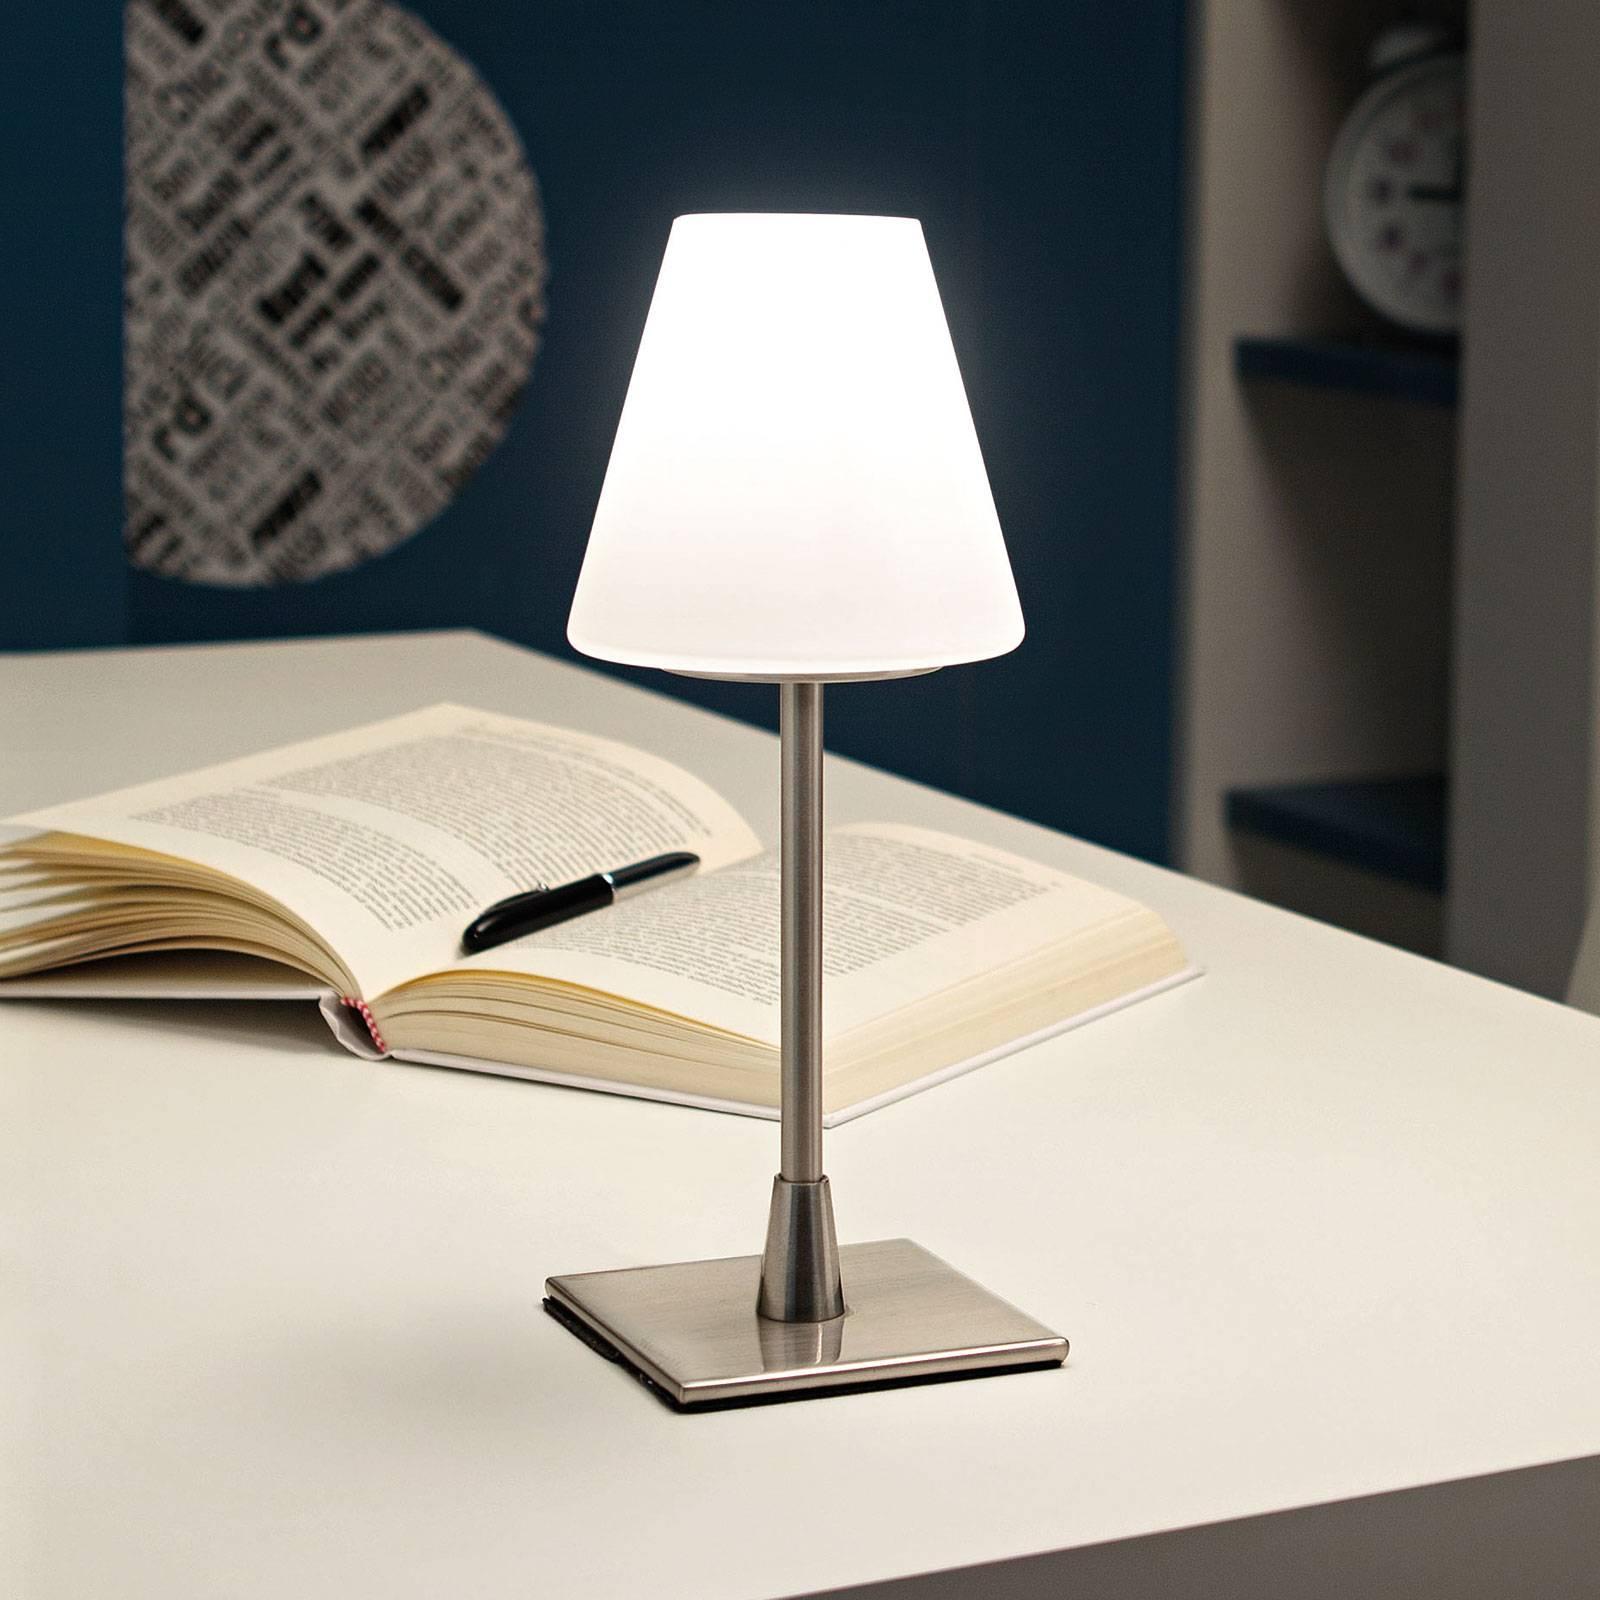 LED tafellamp Lucy met touchdimmer, chroom